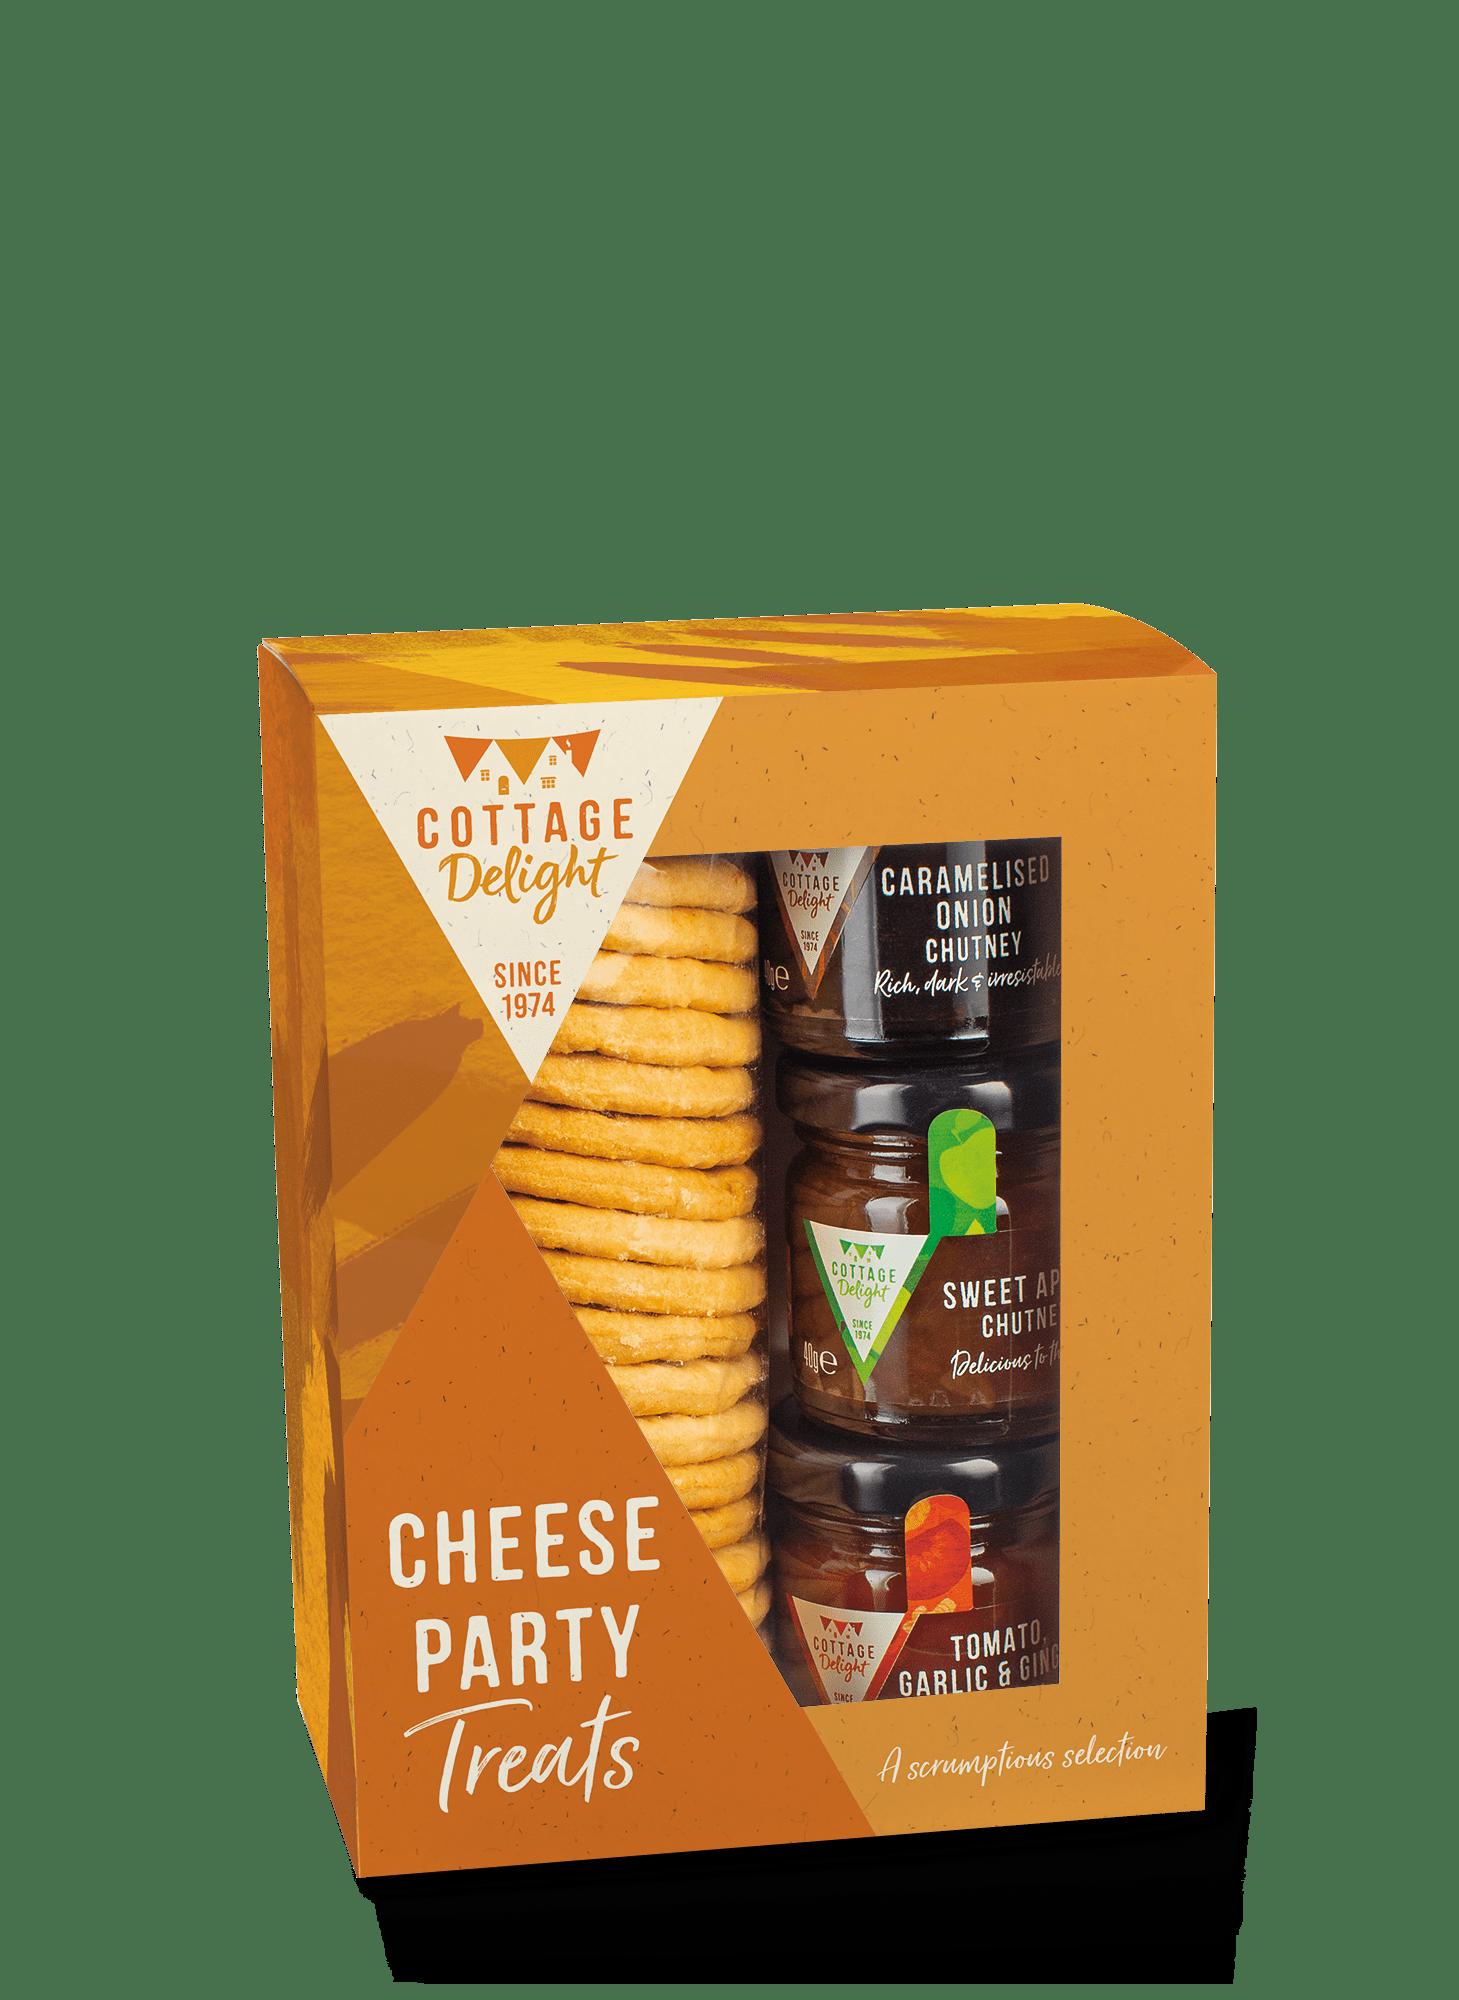 Cheese Party Treats